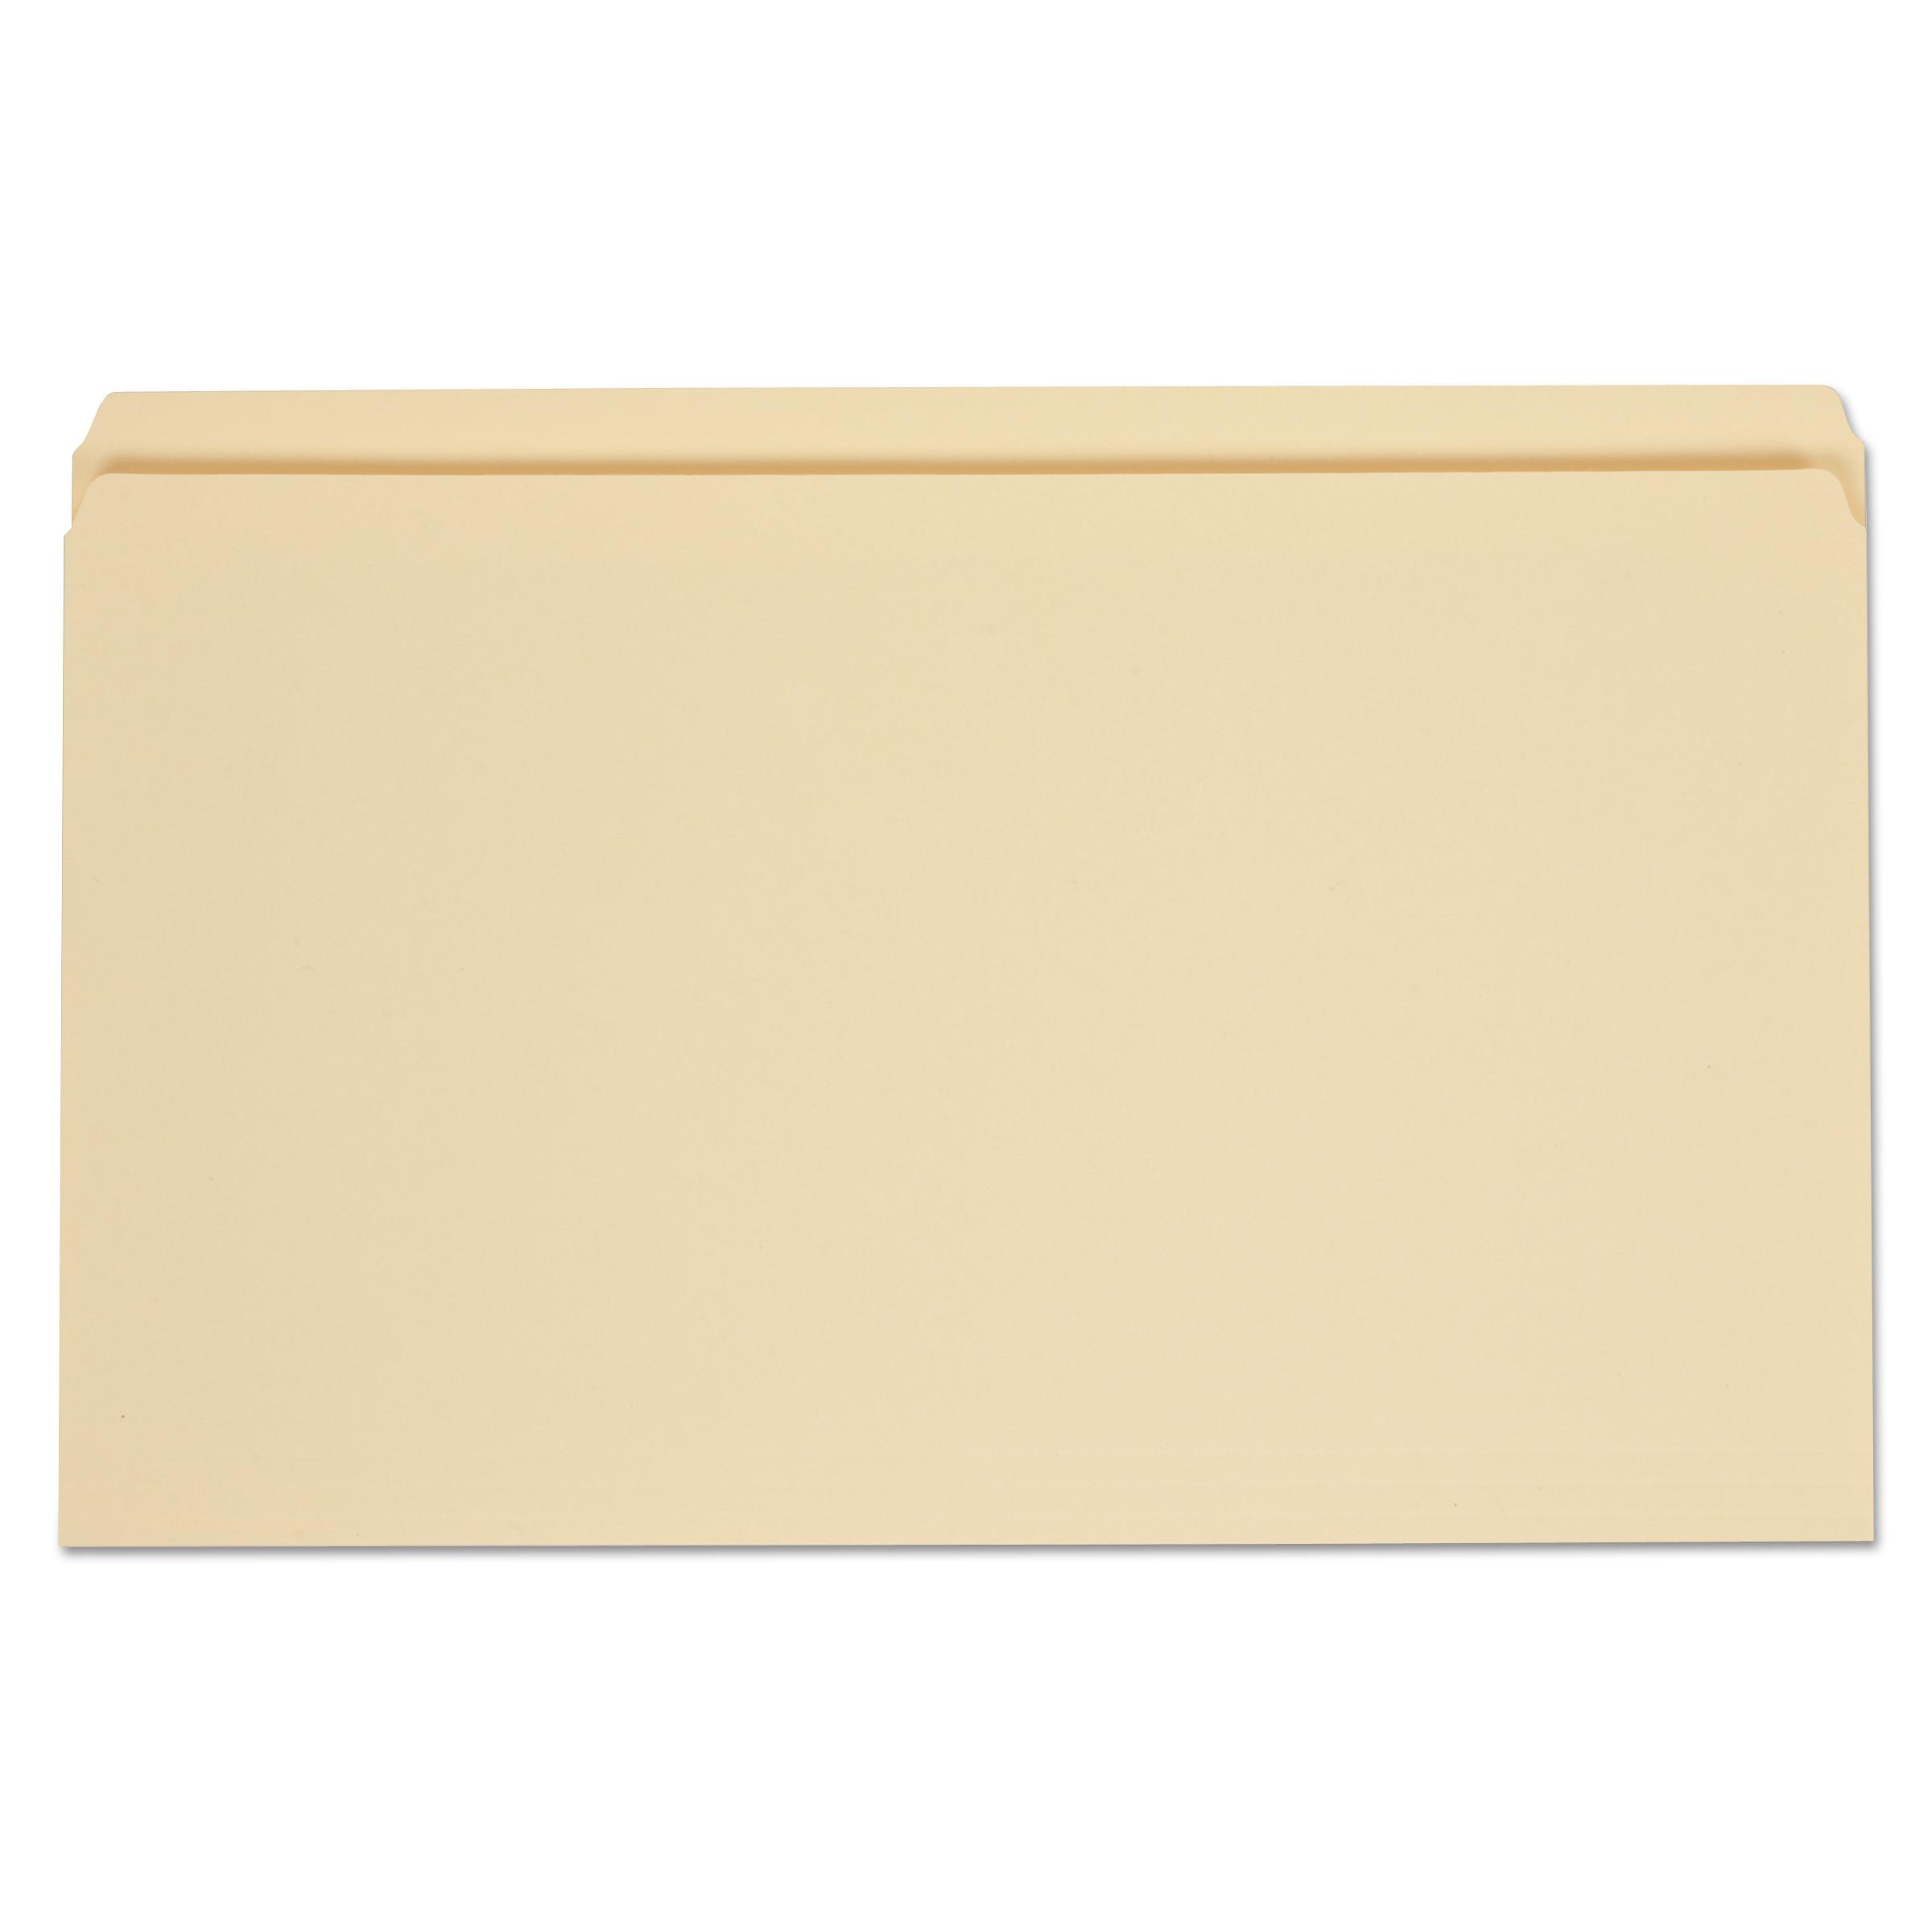 Top Tab Manila File Folders, Straight Tab, Legal Size, 11 pt. Manila, 100/Box